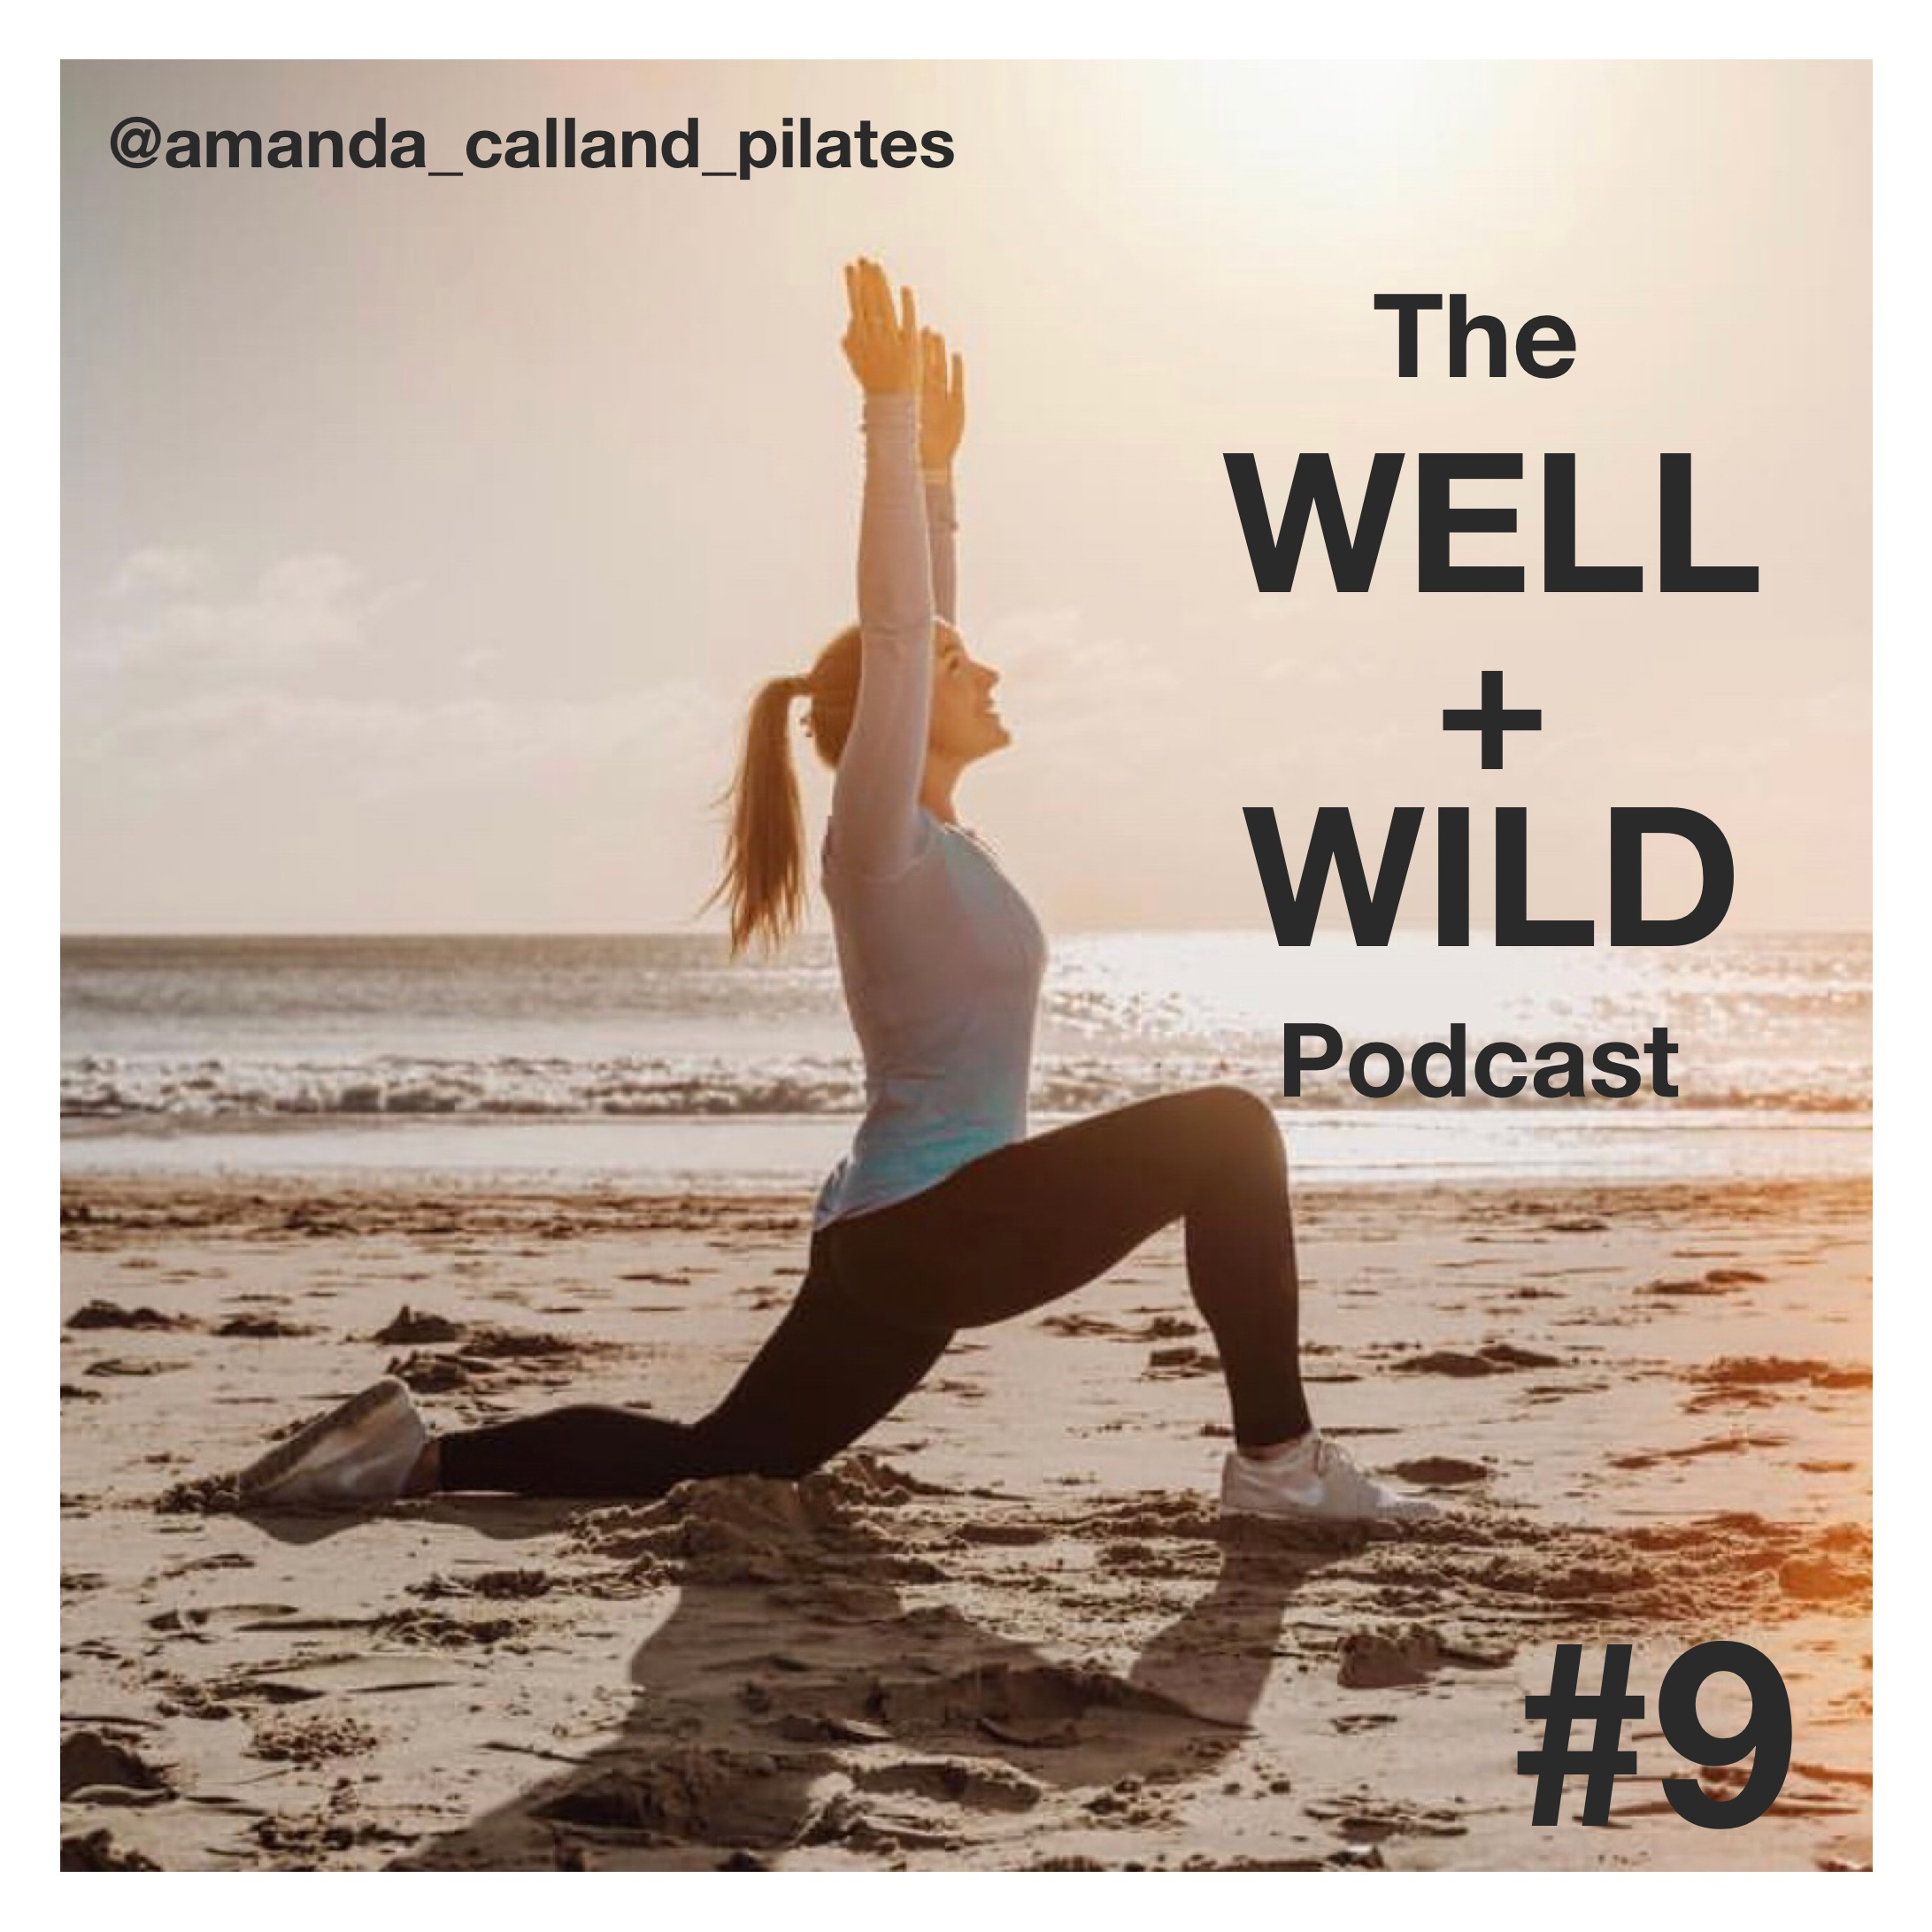 Amanda Calland Pilates